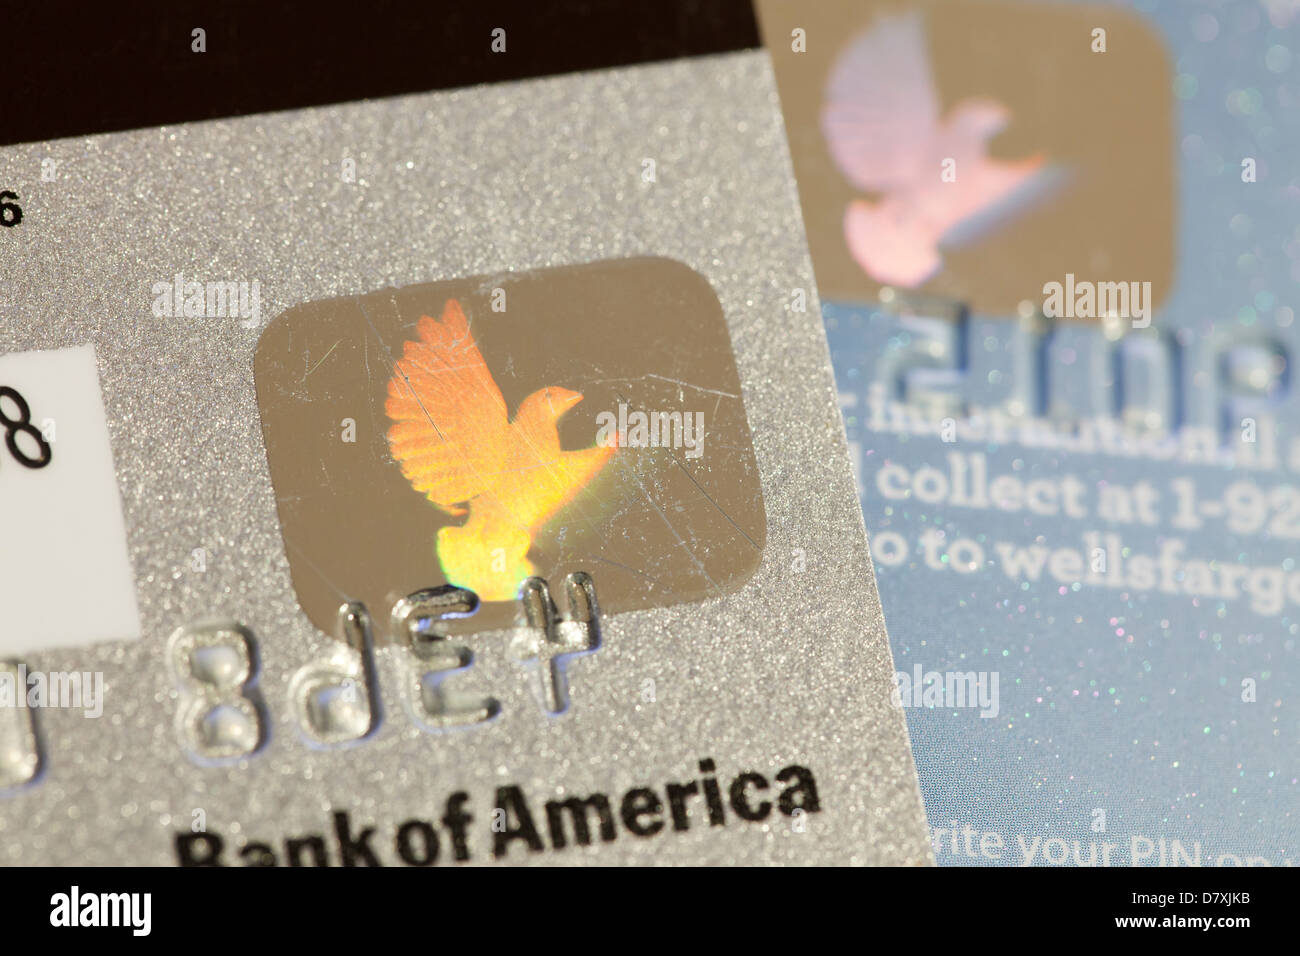 Kreditkarte Sicherheitshologramm Stockbild